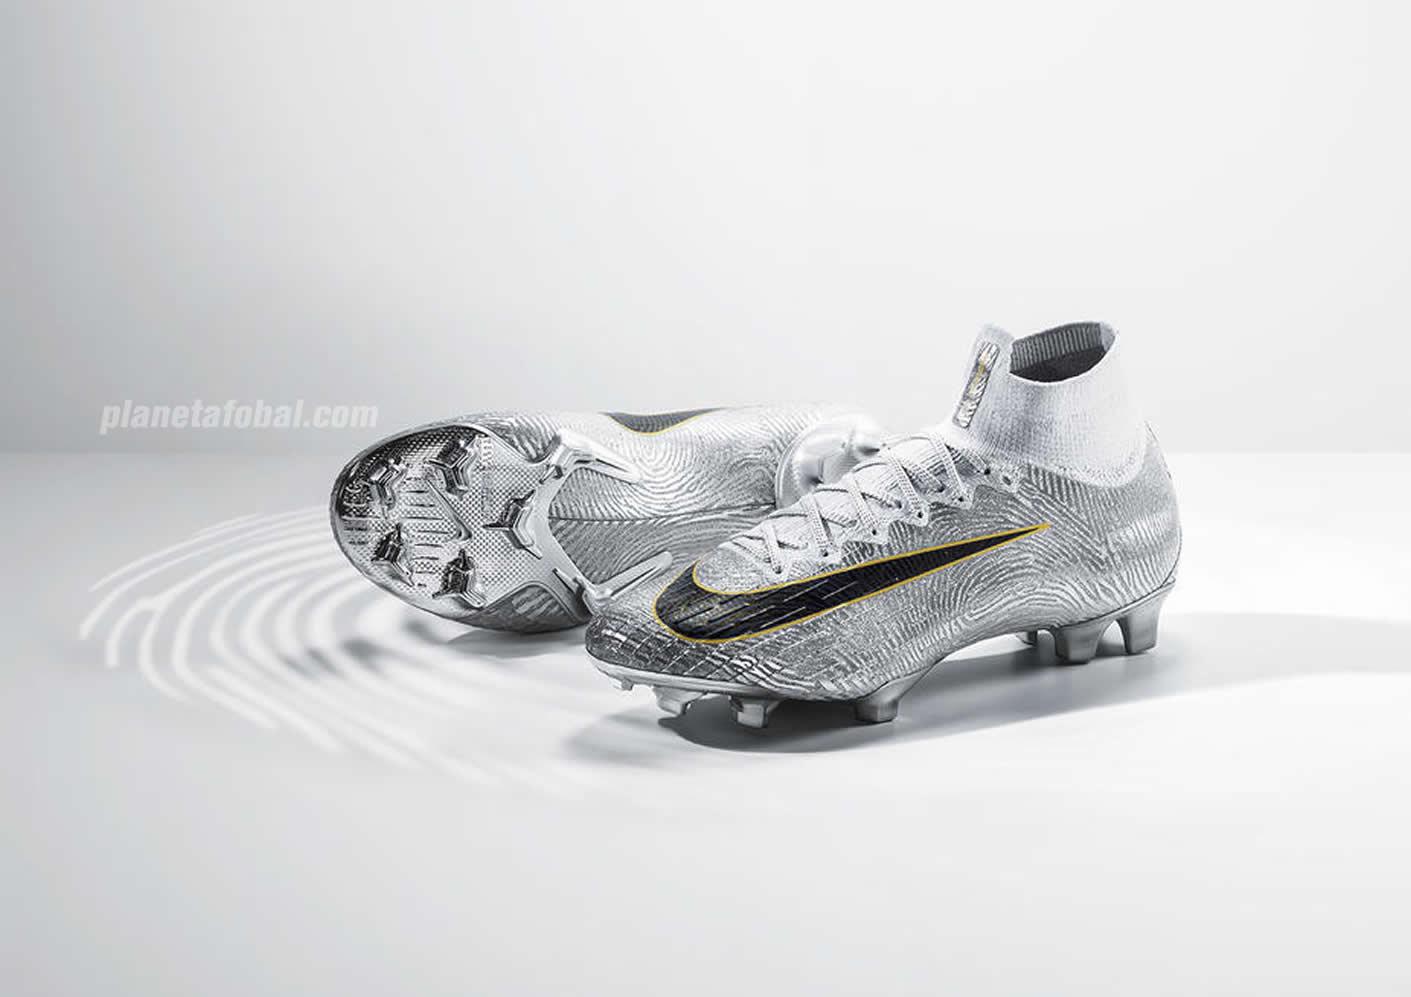 Botines Golden Touch Superfly 360 de Luka Modric | Imagen Nike